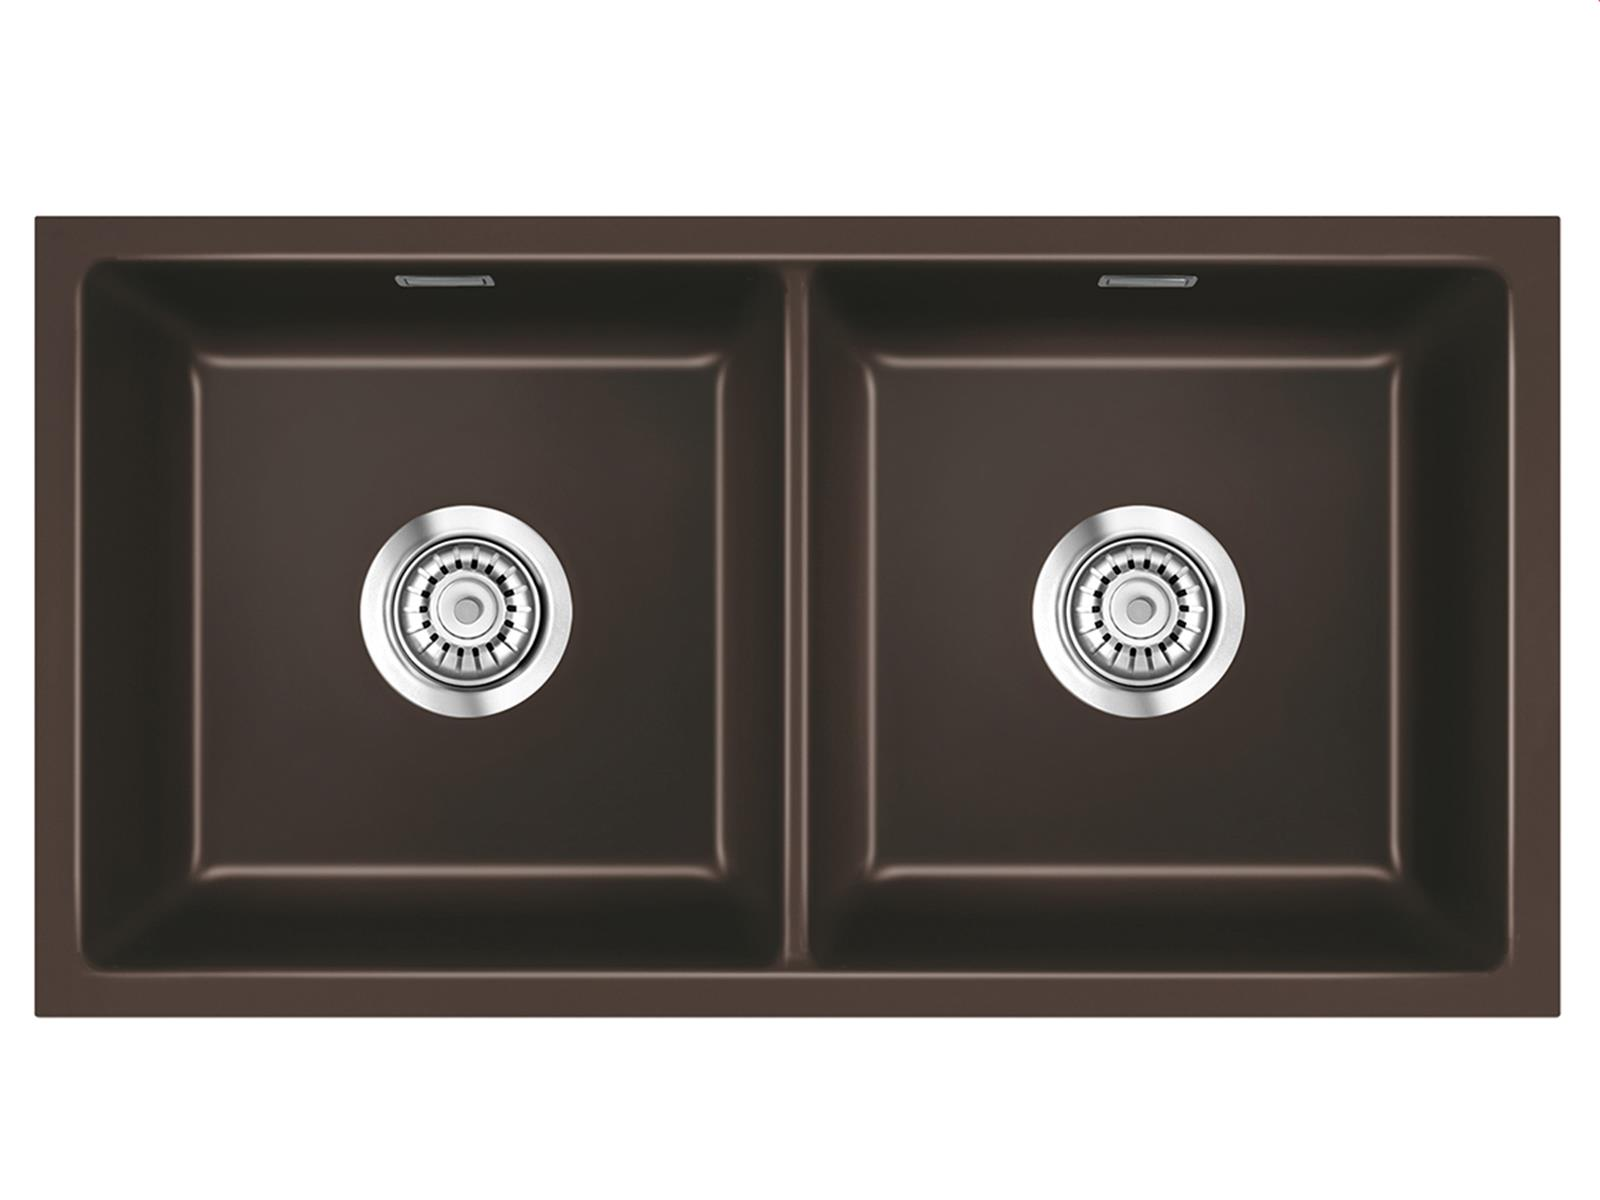 Systemceram Mera Twin U Siena Keramikspüle Excenterbetätigung